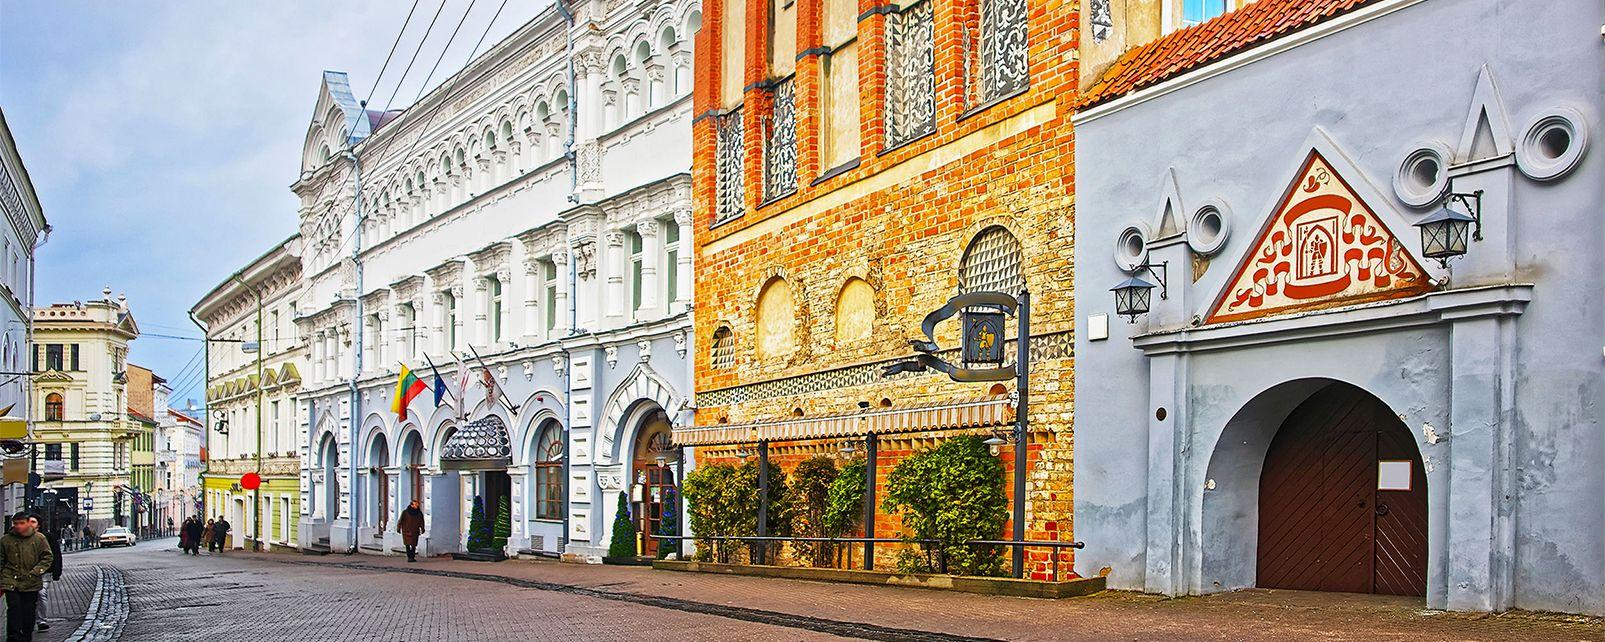 Hotel Europa Royale